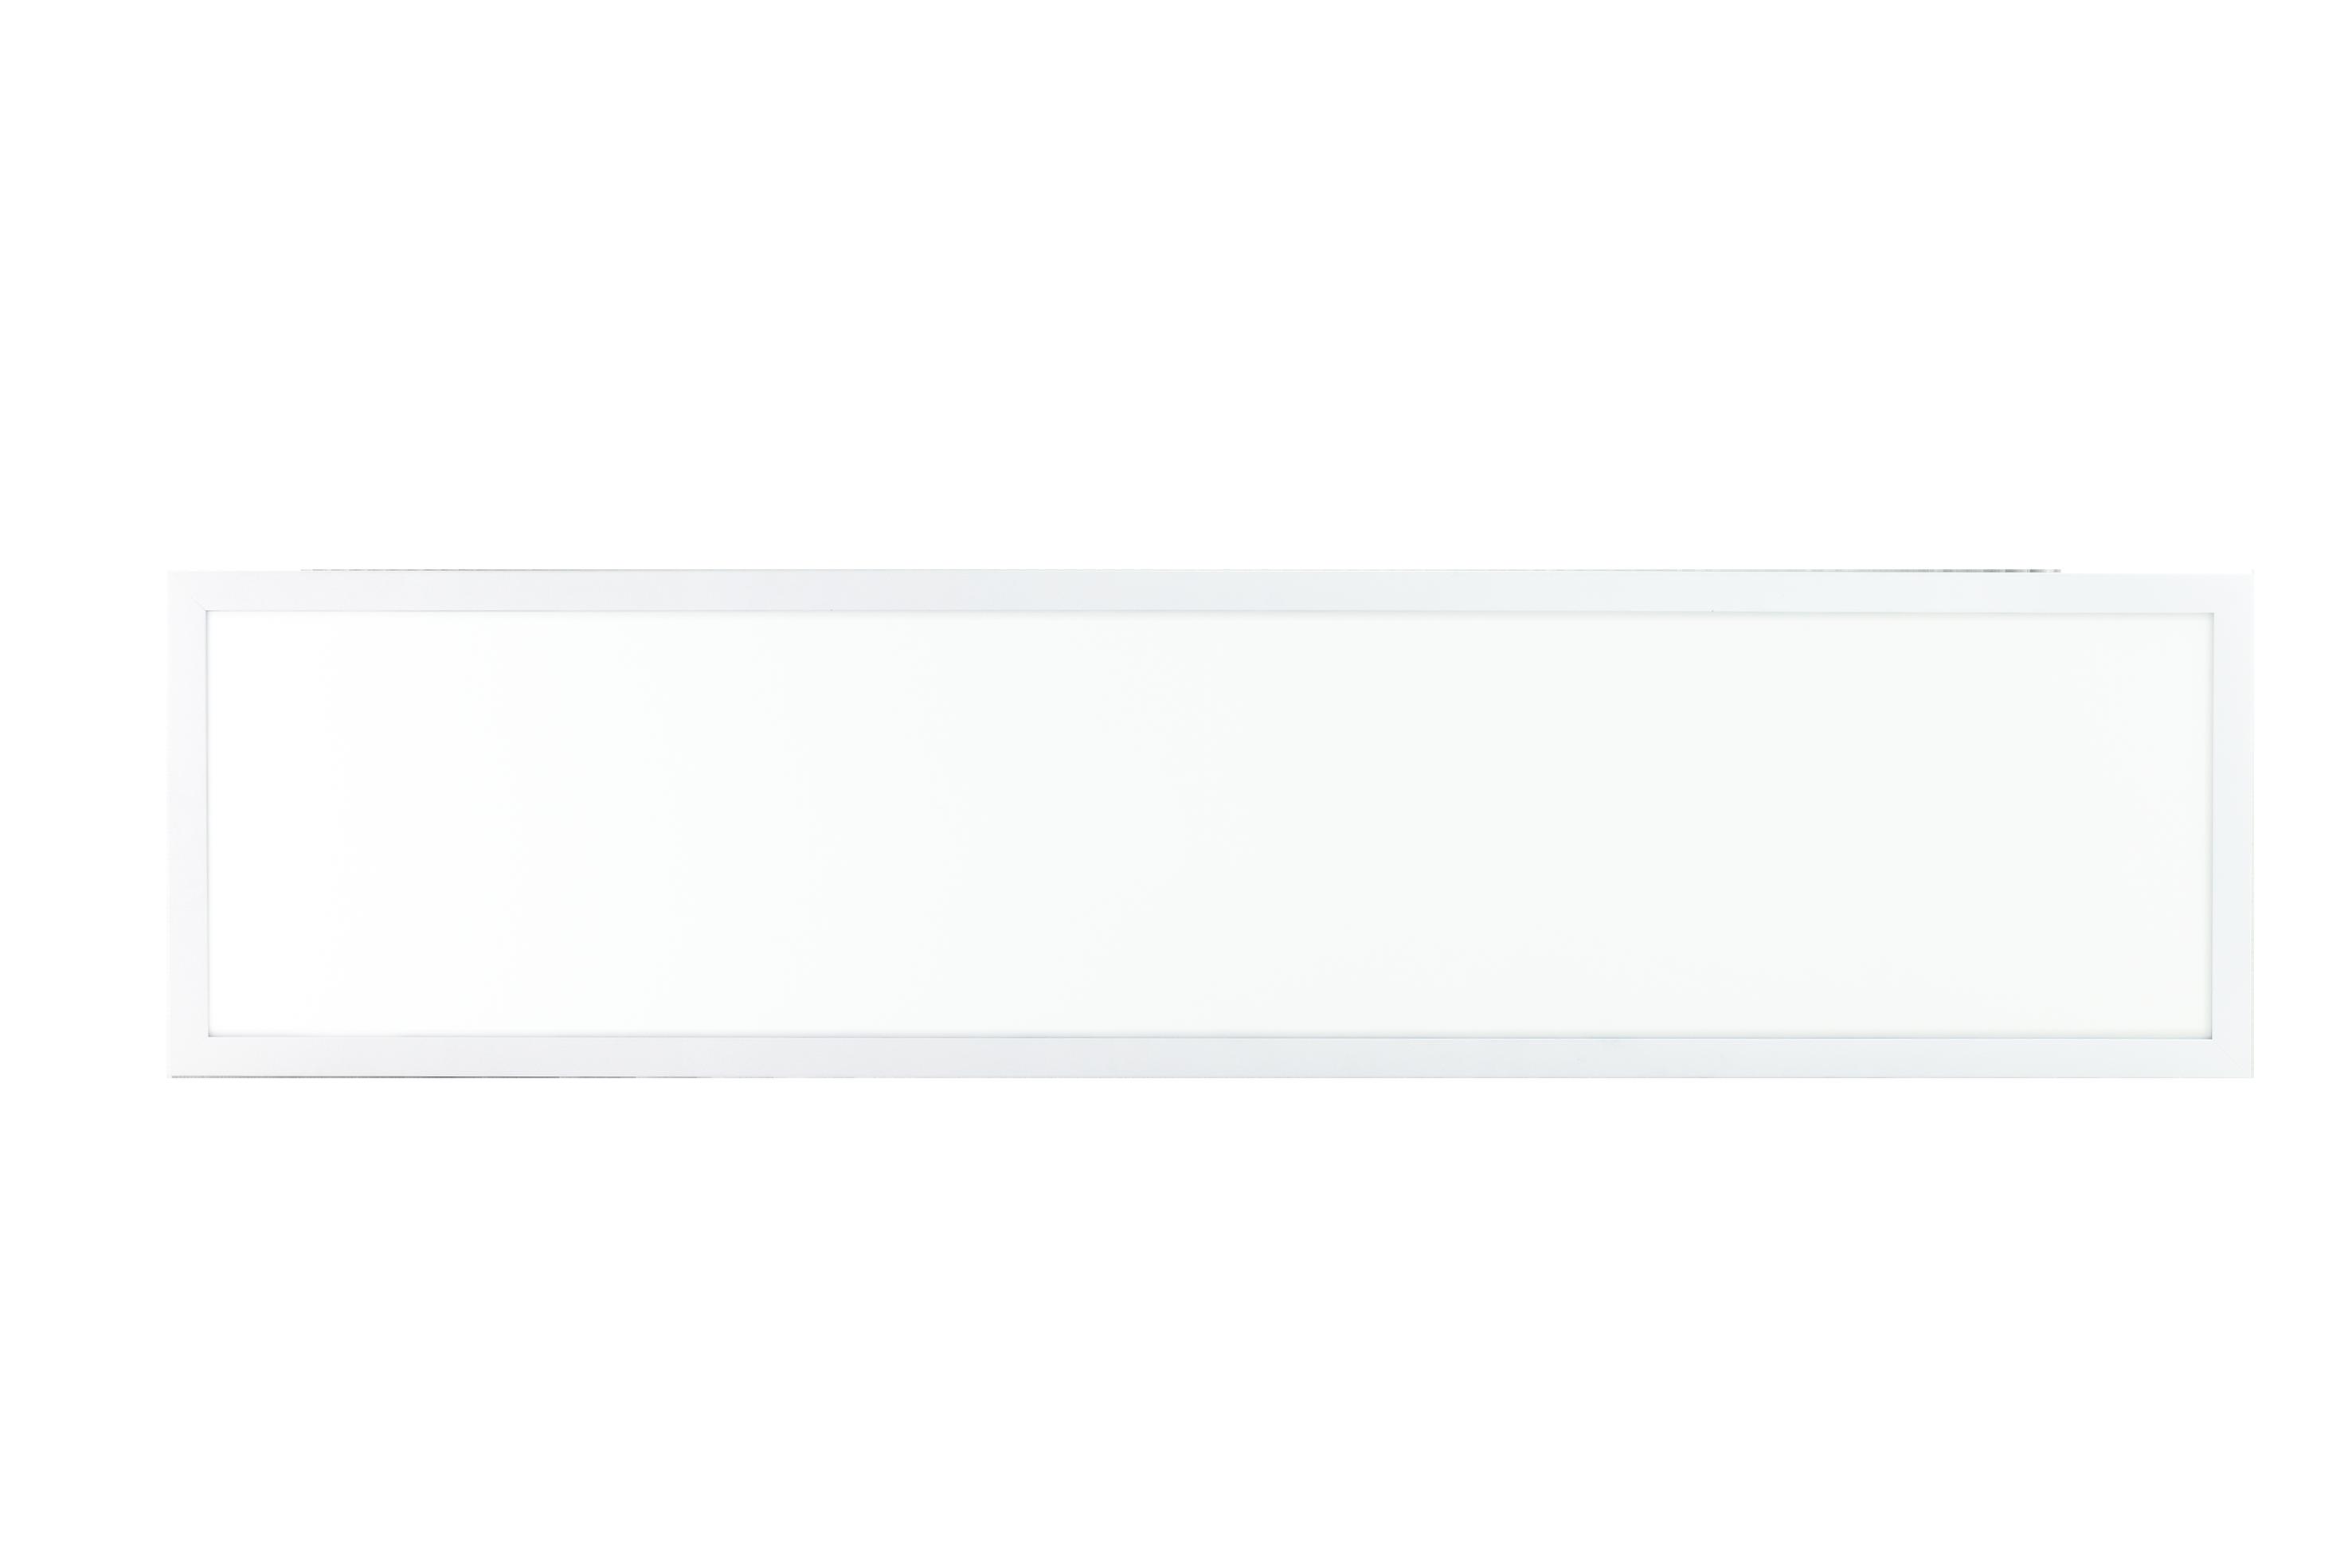 Destiny Panel (Cyanosis)